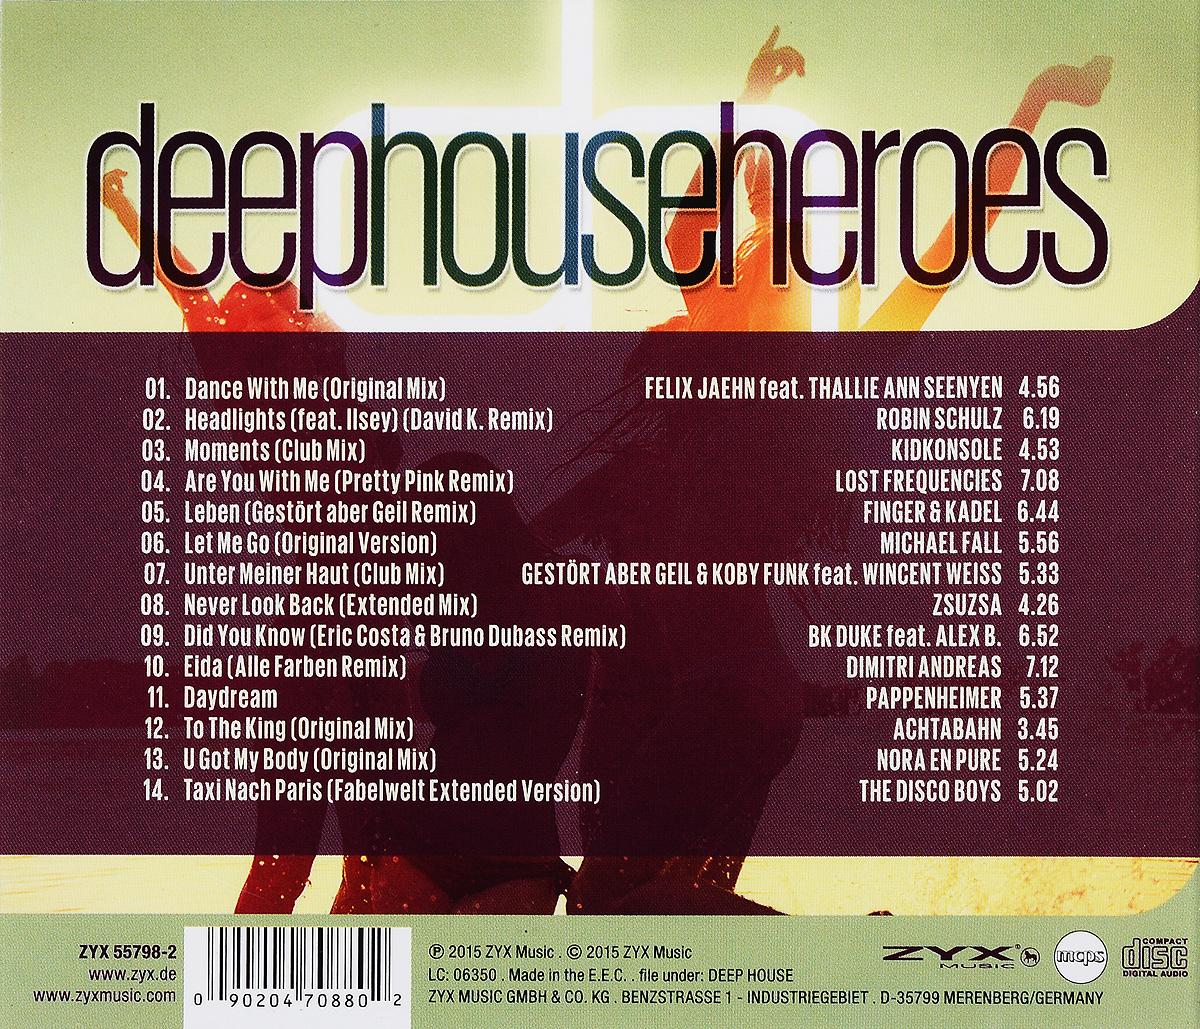 Deep House Heroes Волтэкс-инвест,ZYX Music